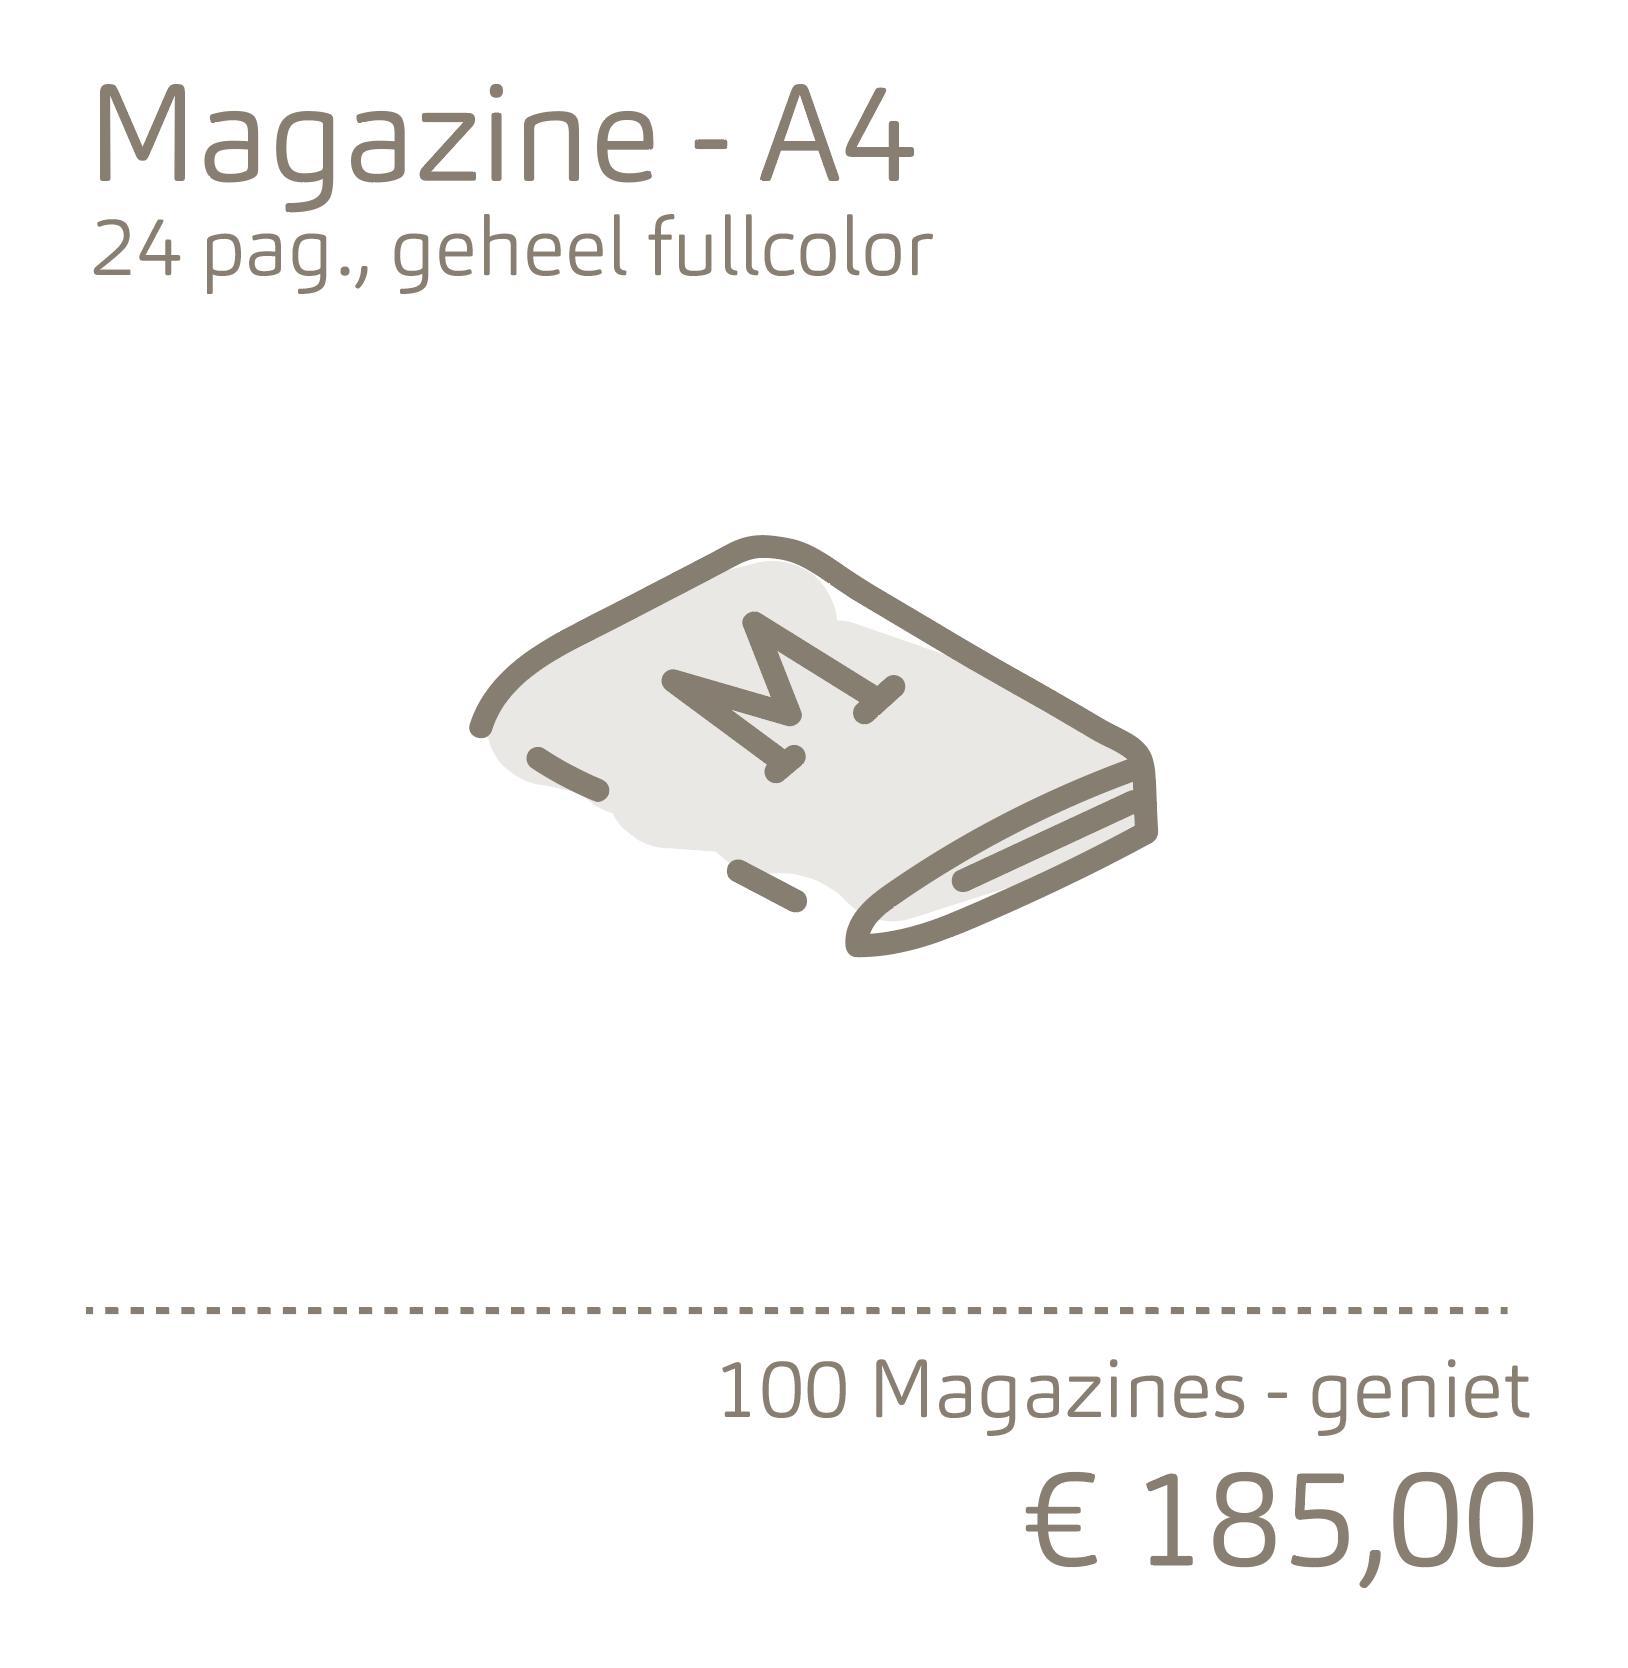 Magazines - A4